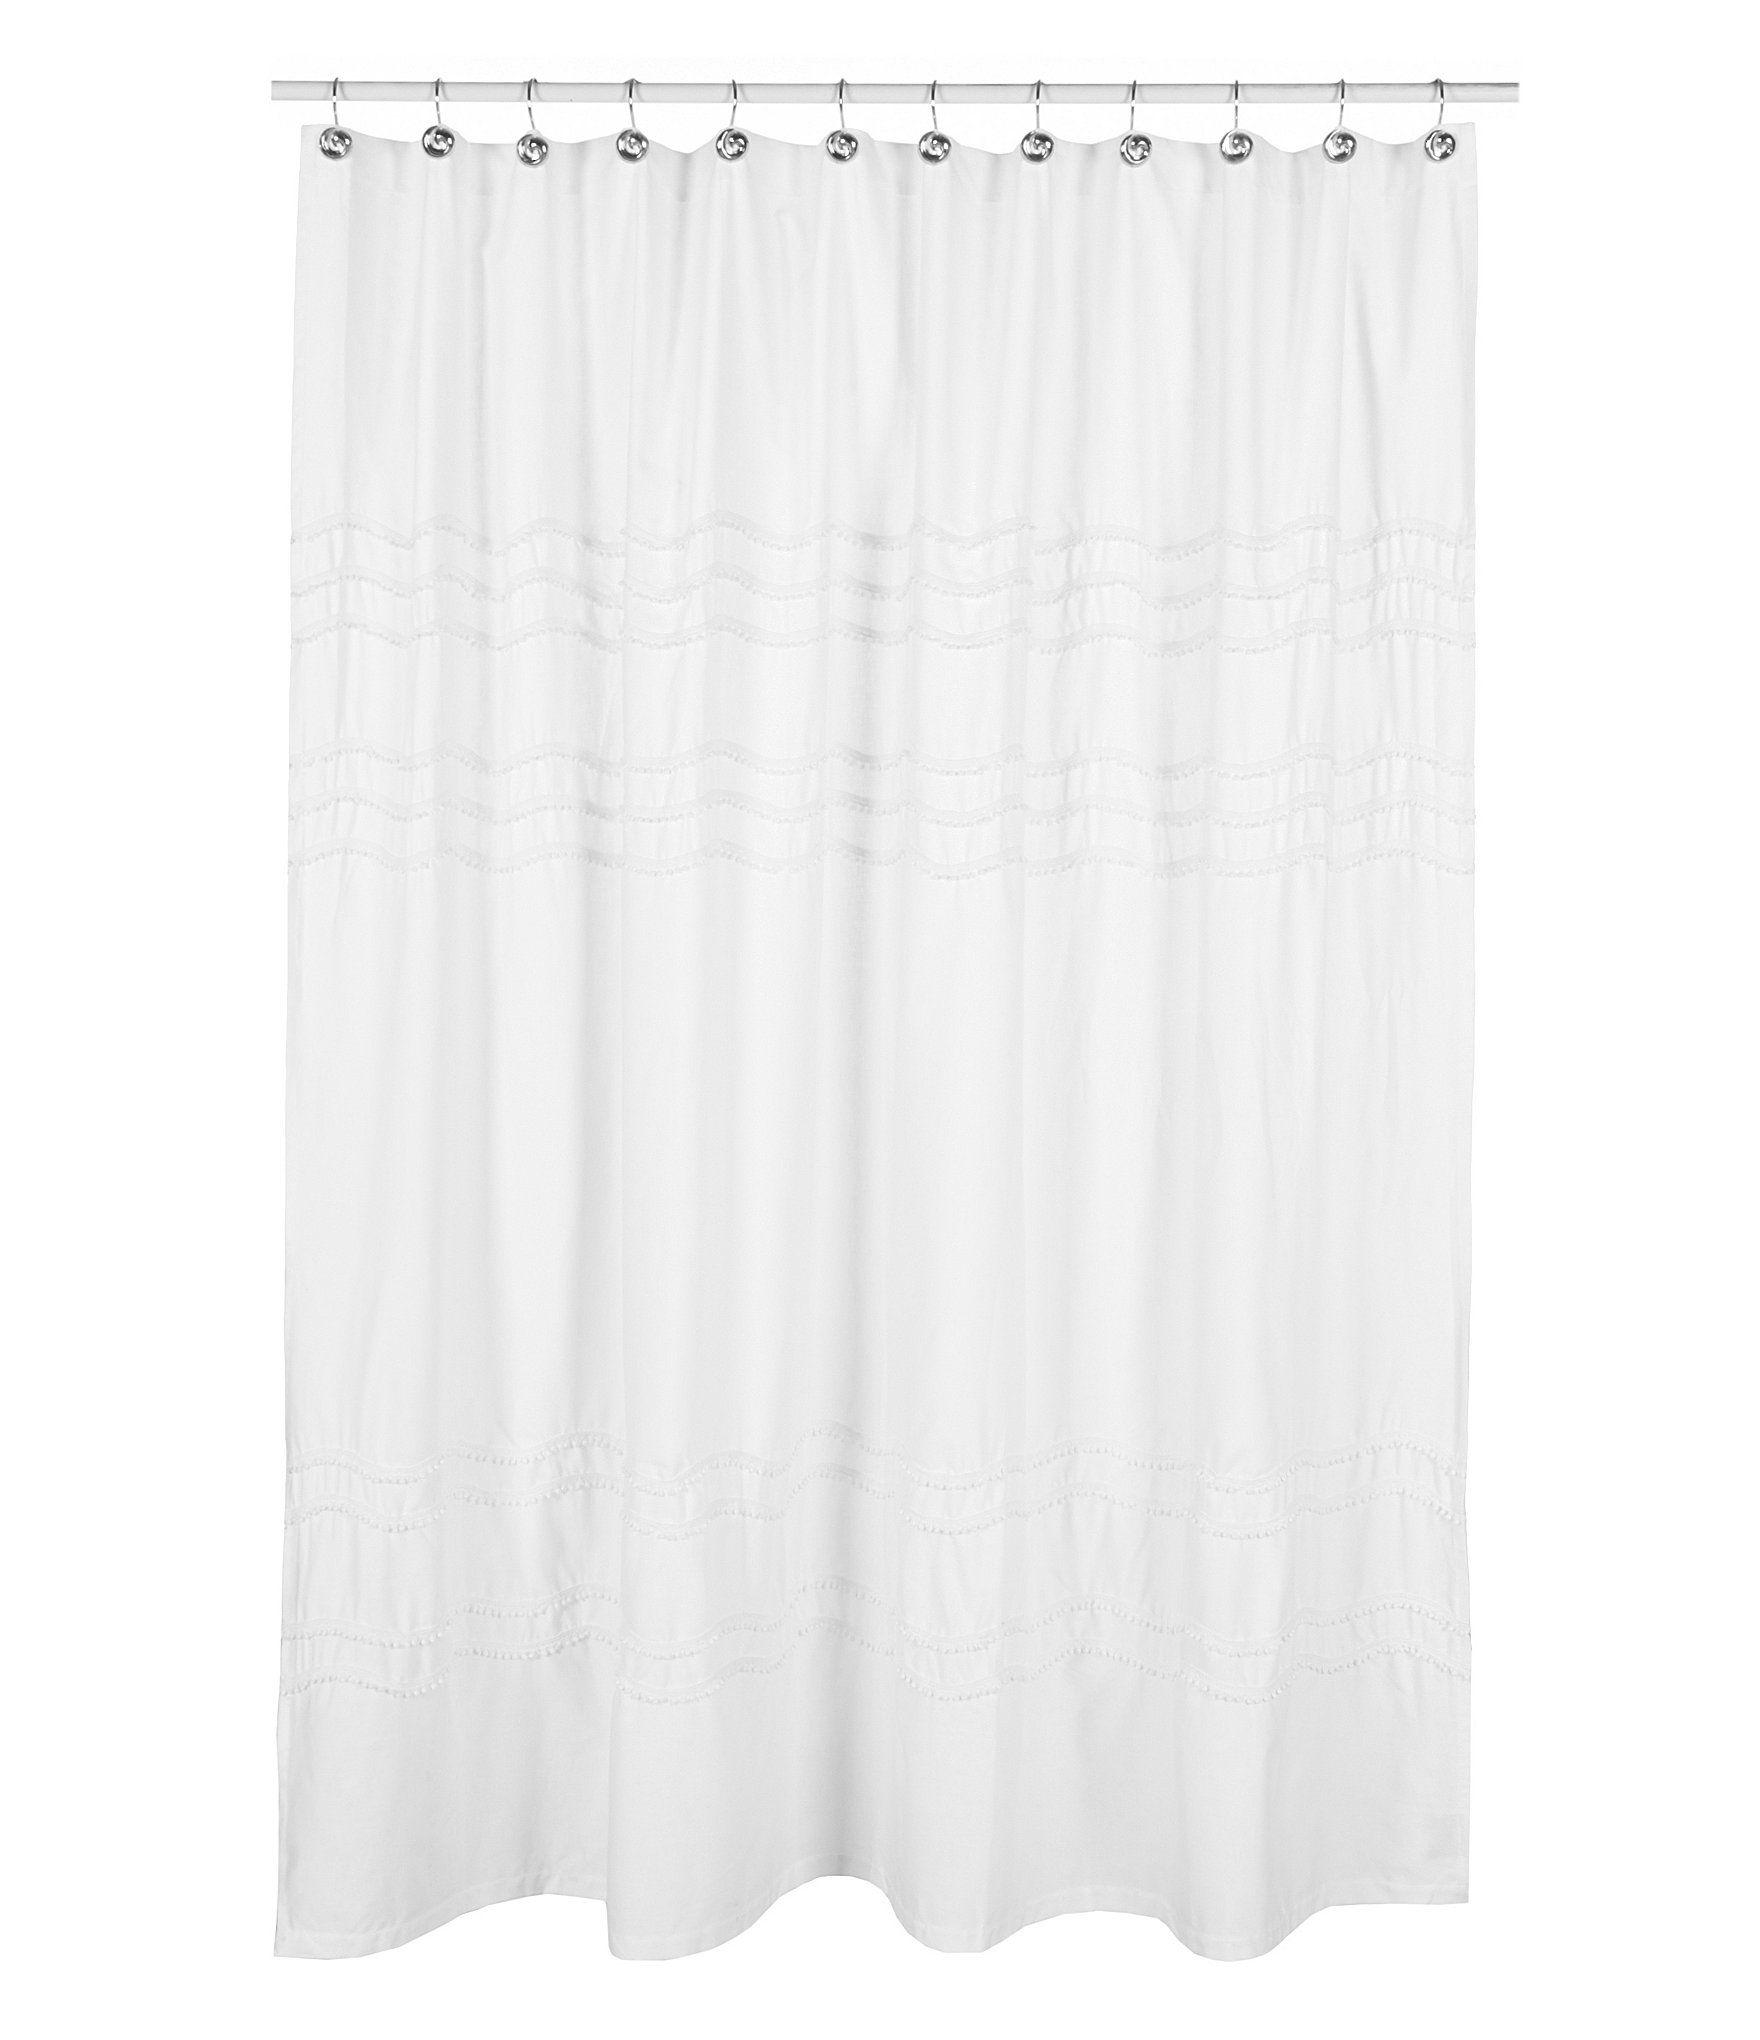 Captivating Southern Living Chantilly Chevron Pom Pom Linen Shower Curtain